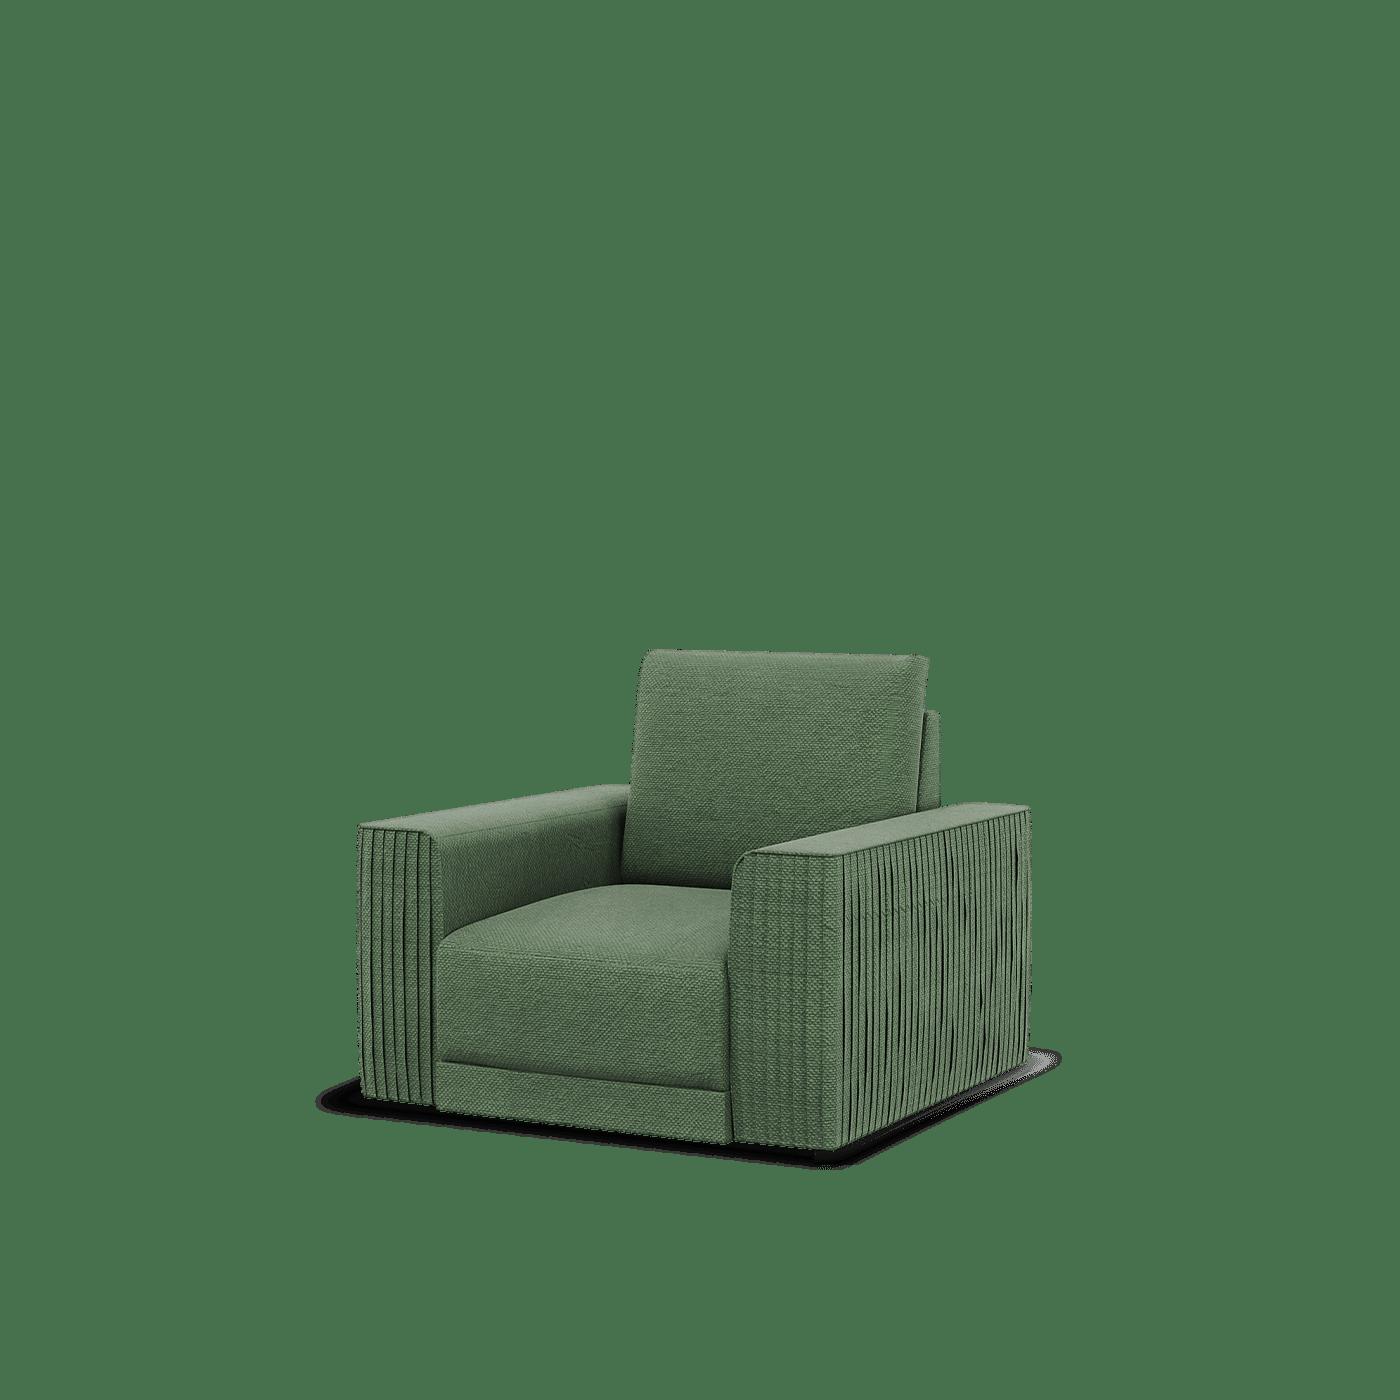 Holf M1 1 seater sofa